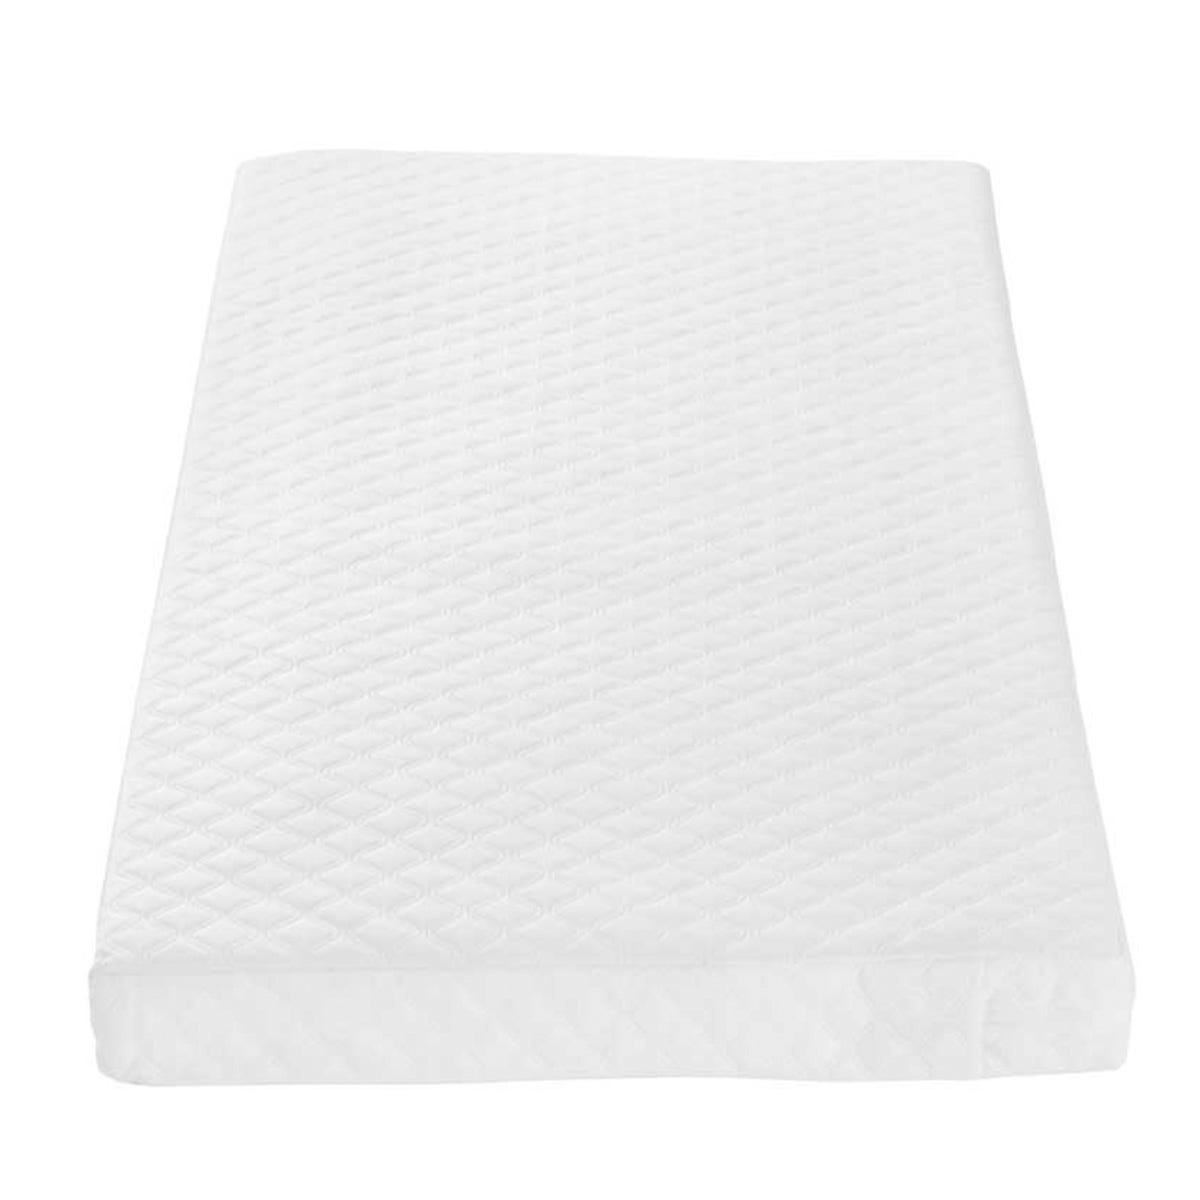 Tutti Bambini Sprung Cot Mattress (60 x 120 cm) - White